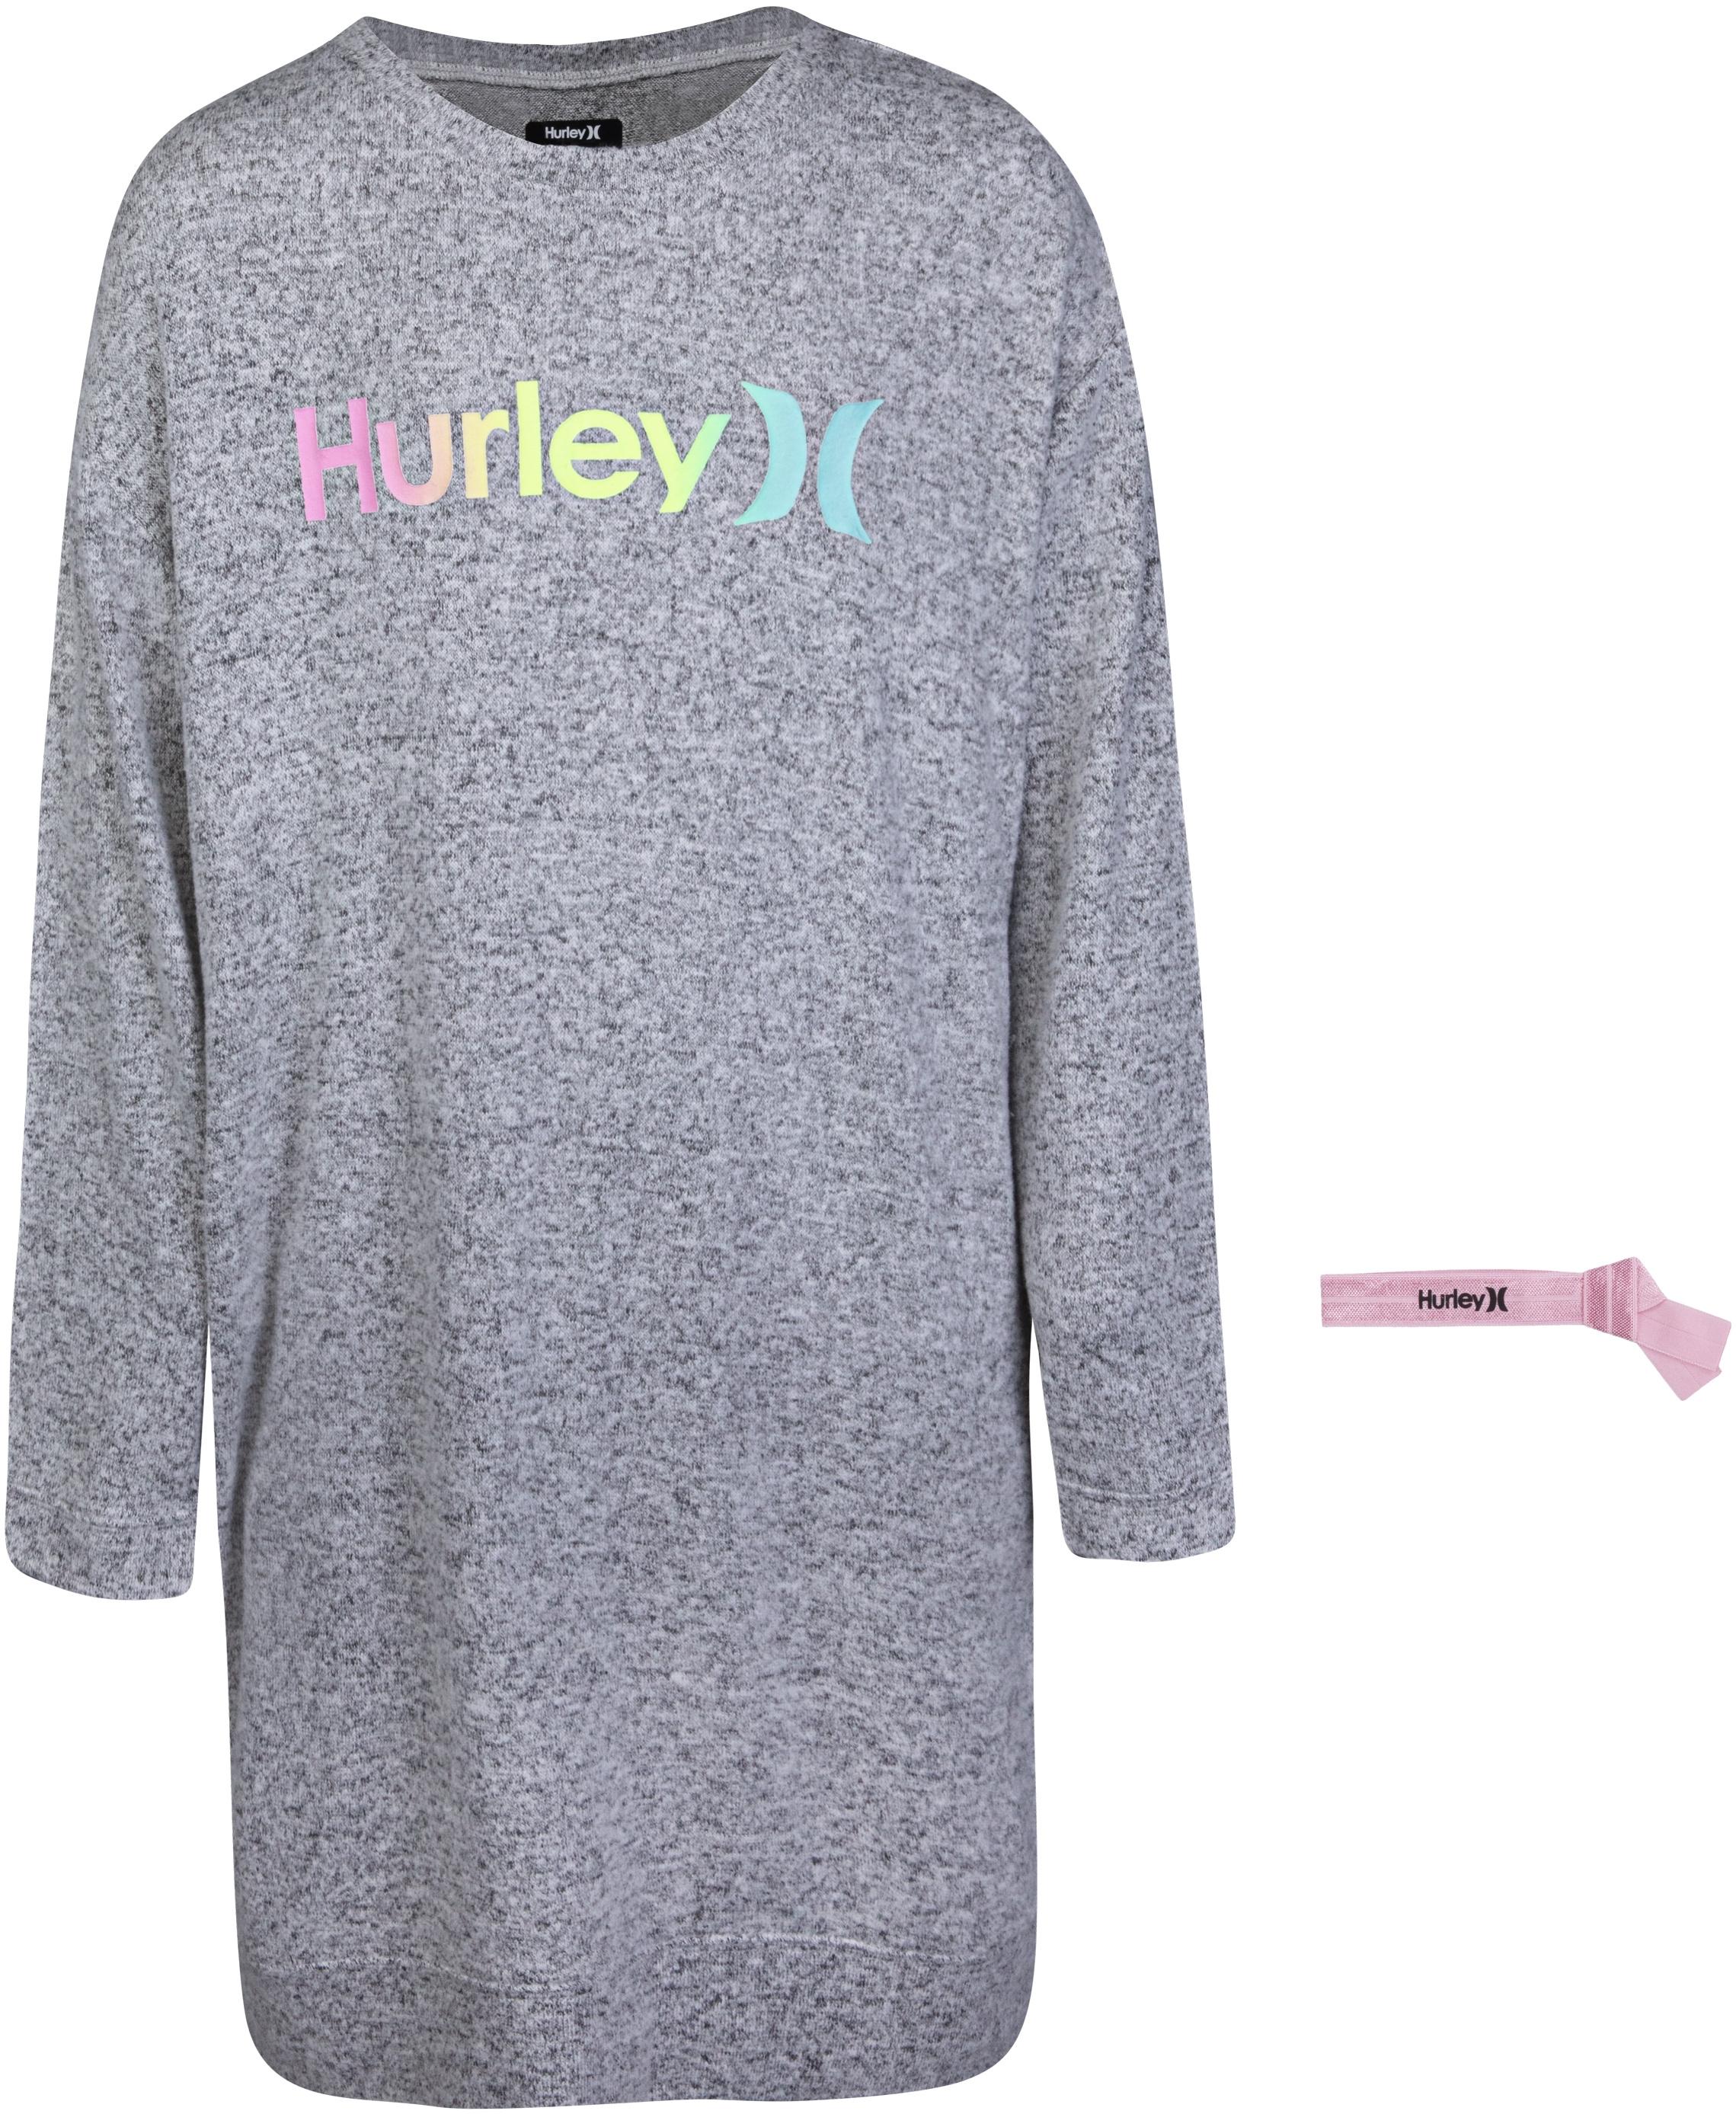 One & Only Super Soft Sweatshirt Dress (Big Kids) Hurley Kids